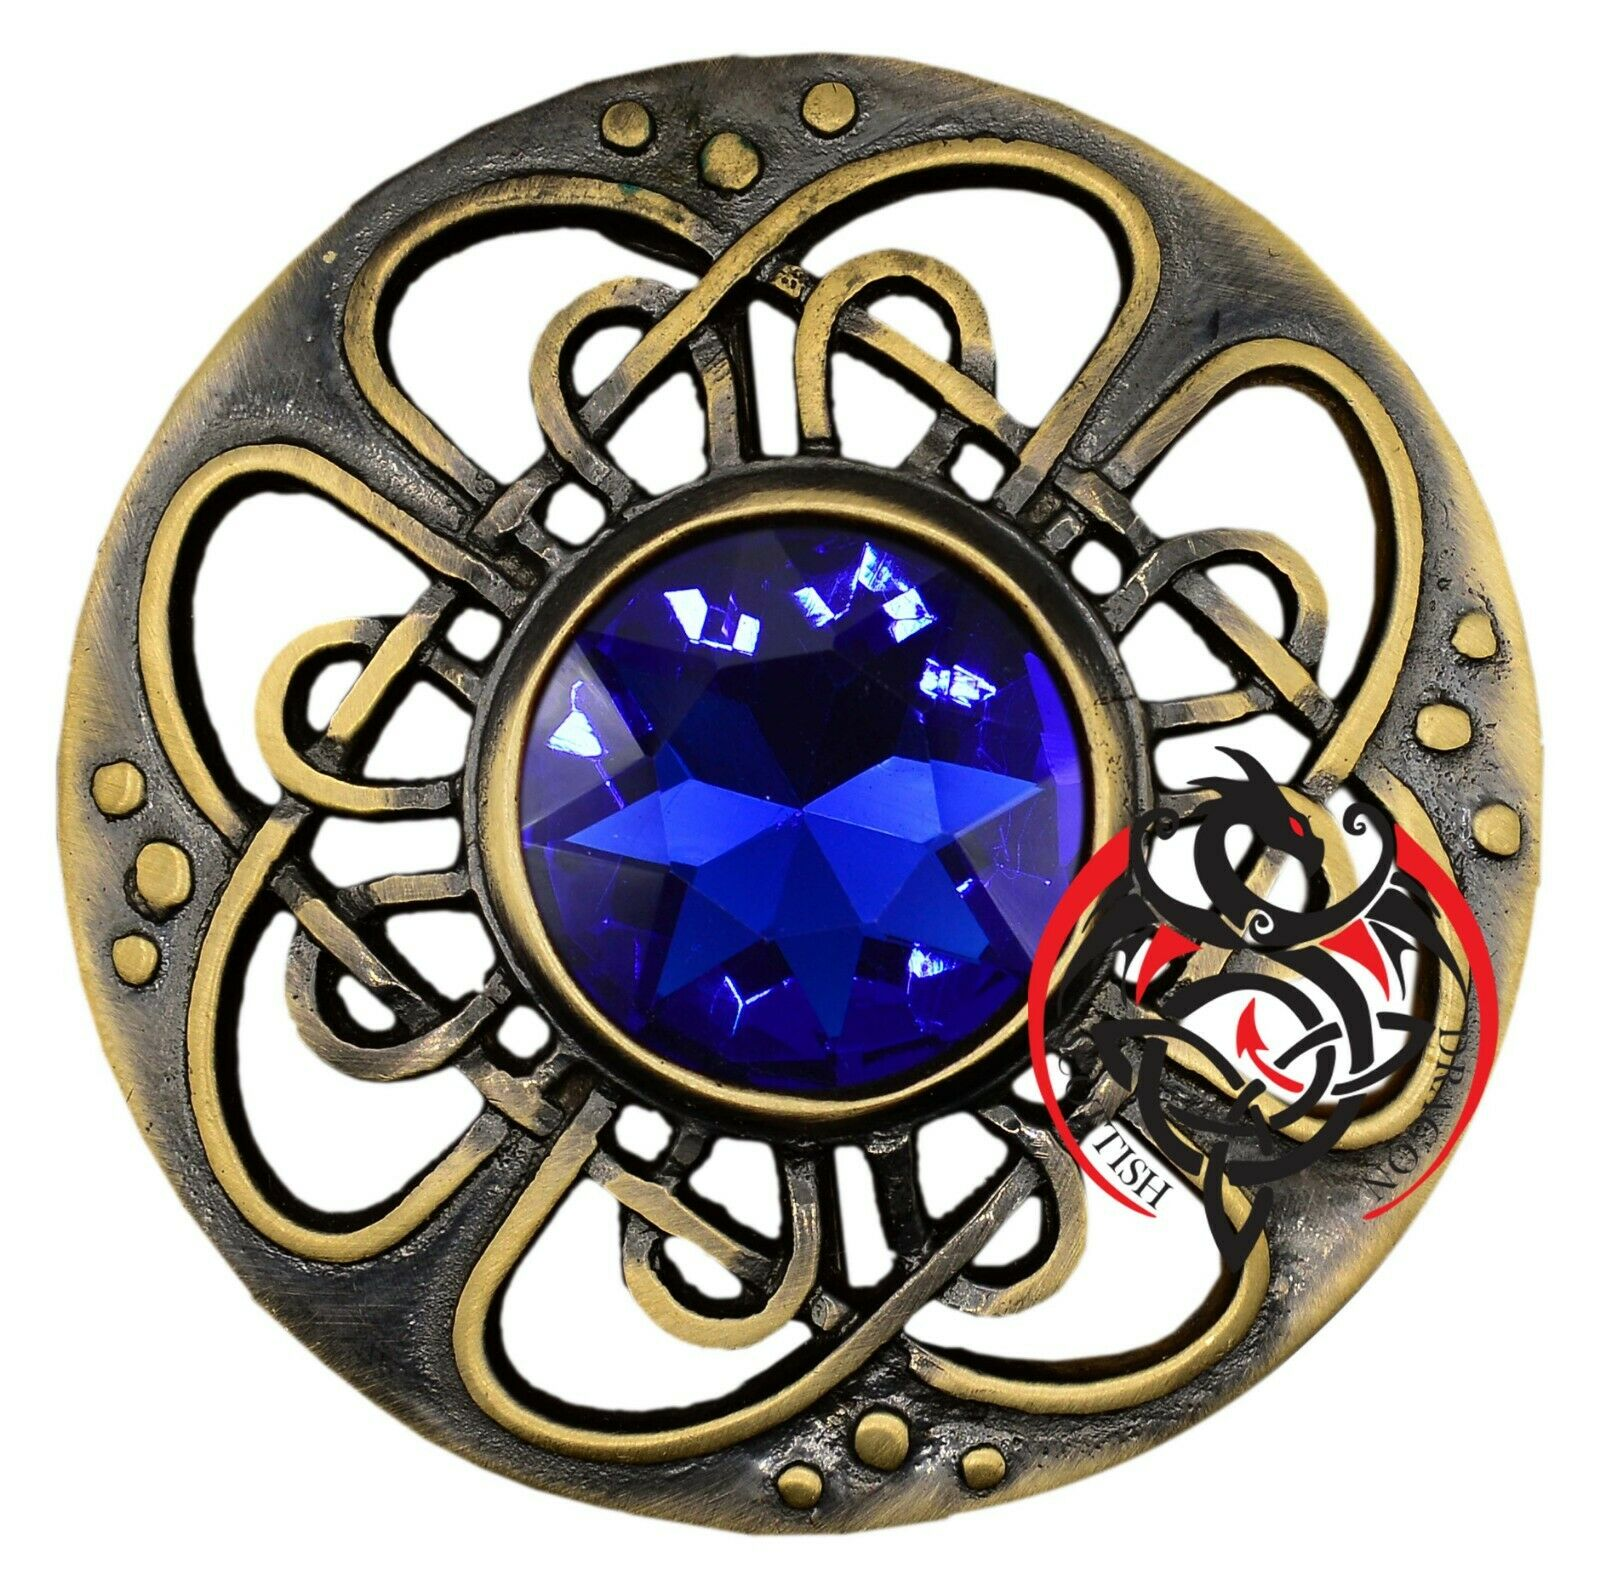 Scottish Kilt Fly Plaid Brooch Navy Blue Antique Gold Scottish Celtic Brooches 3